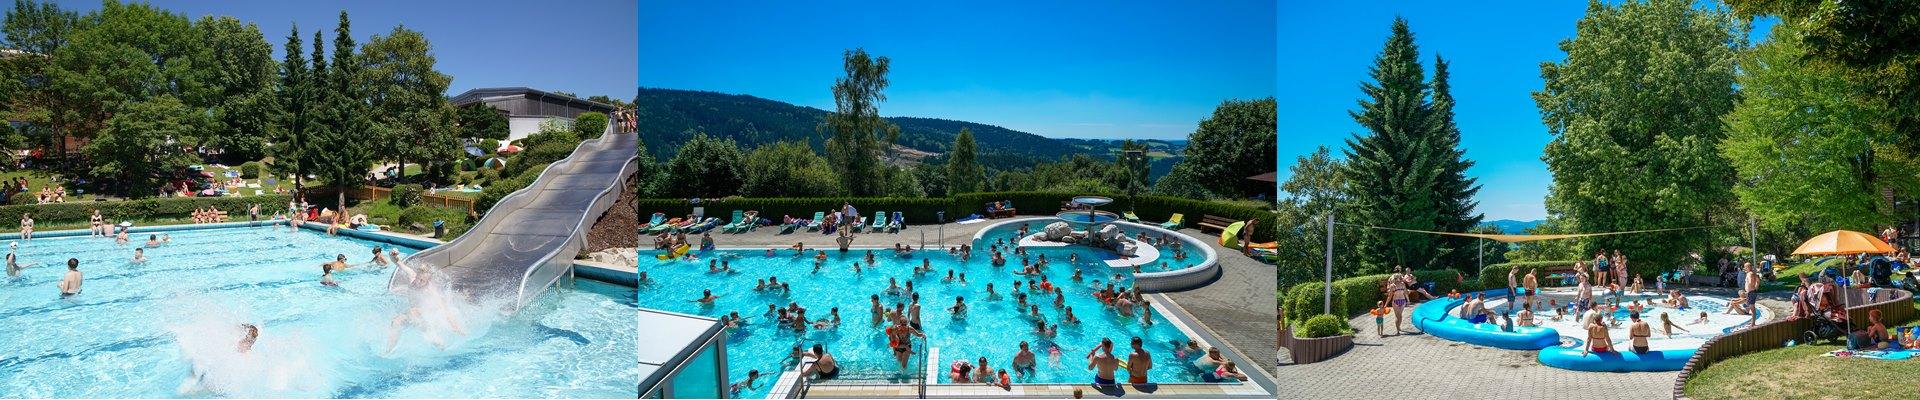 Der Karoli-Badepark – das Freibad